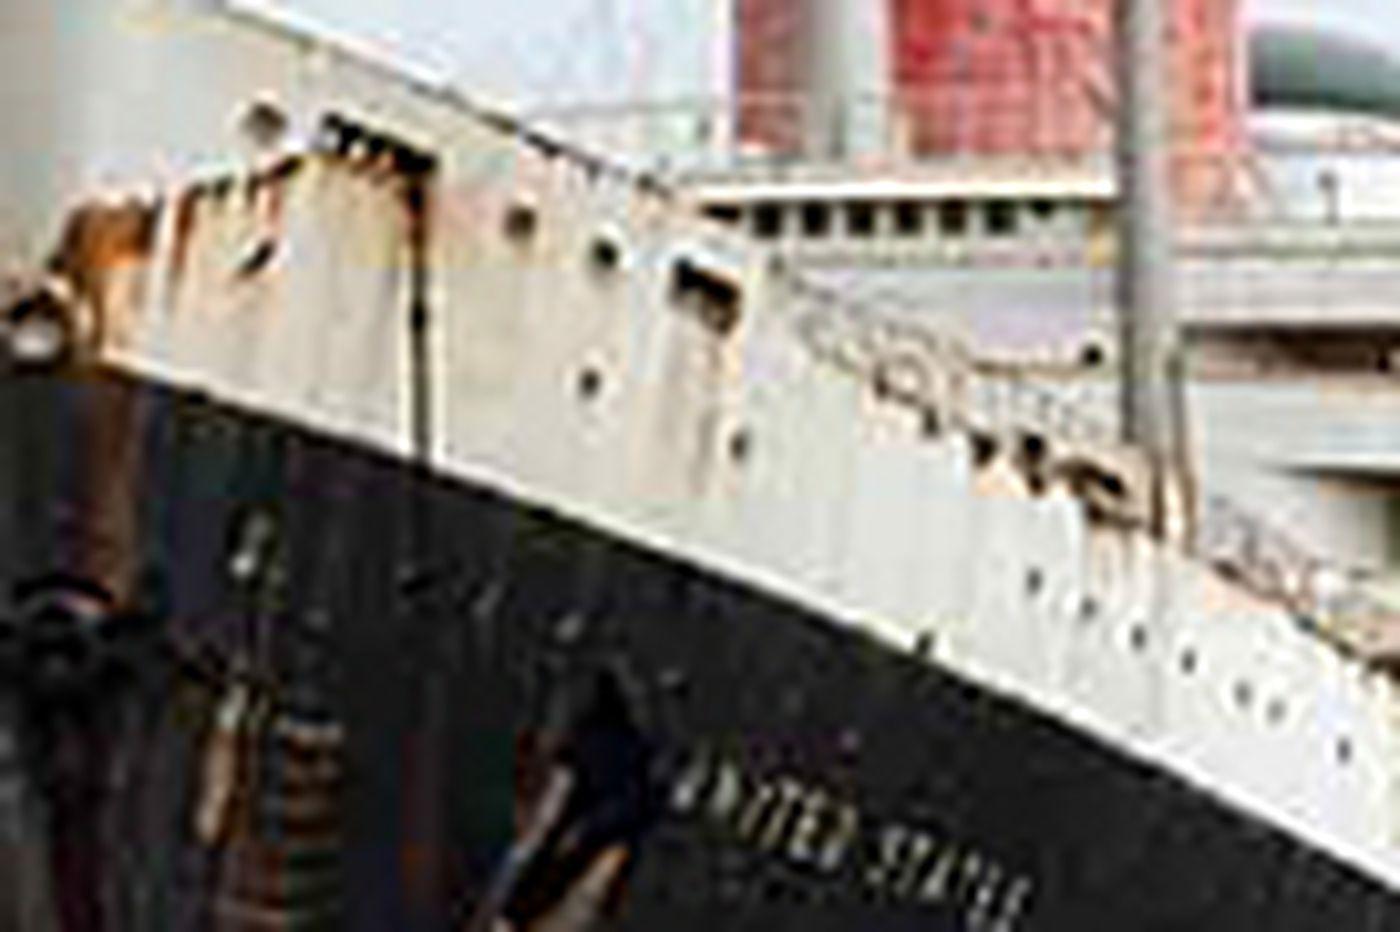 Phila. philanthropist to aid purchase of iconic ship